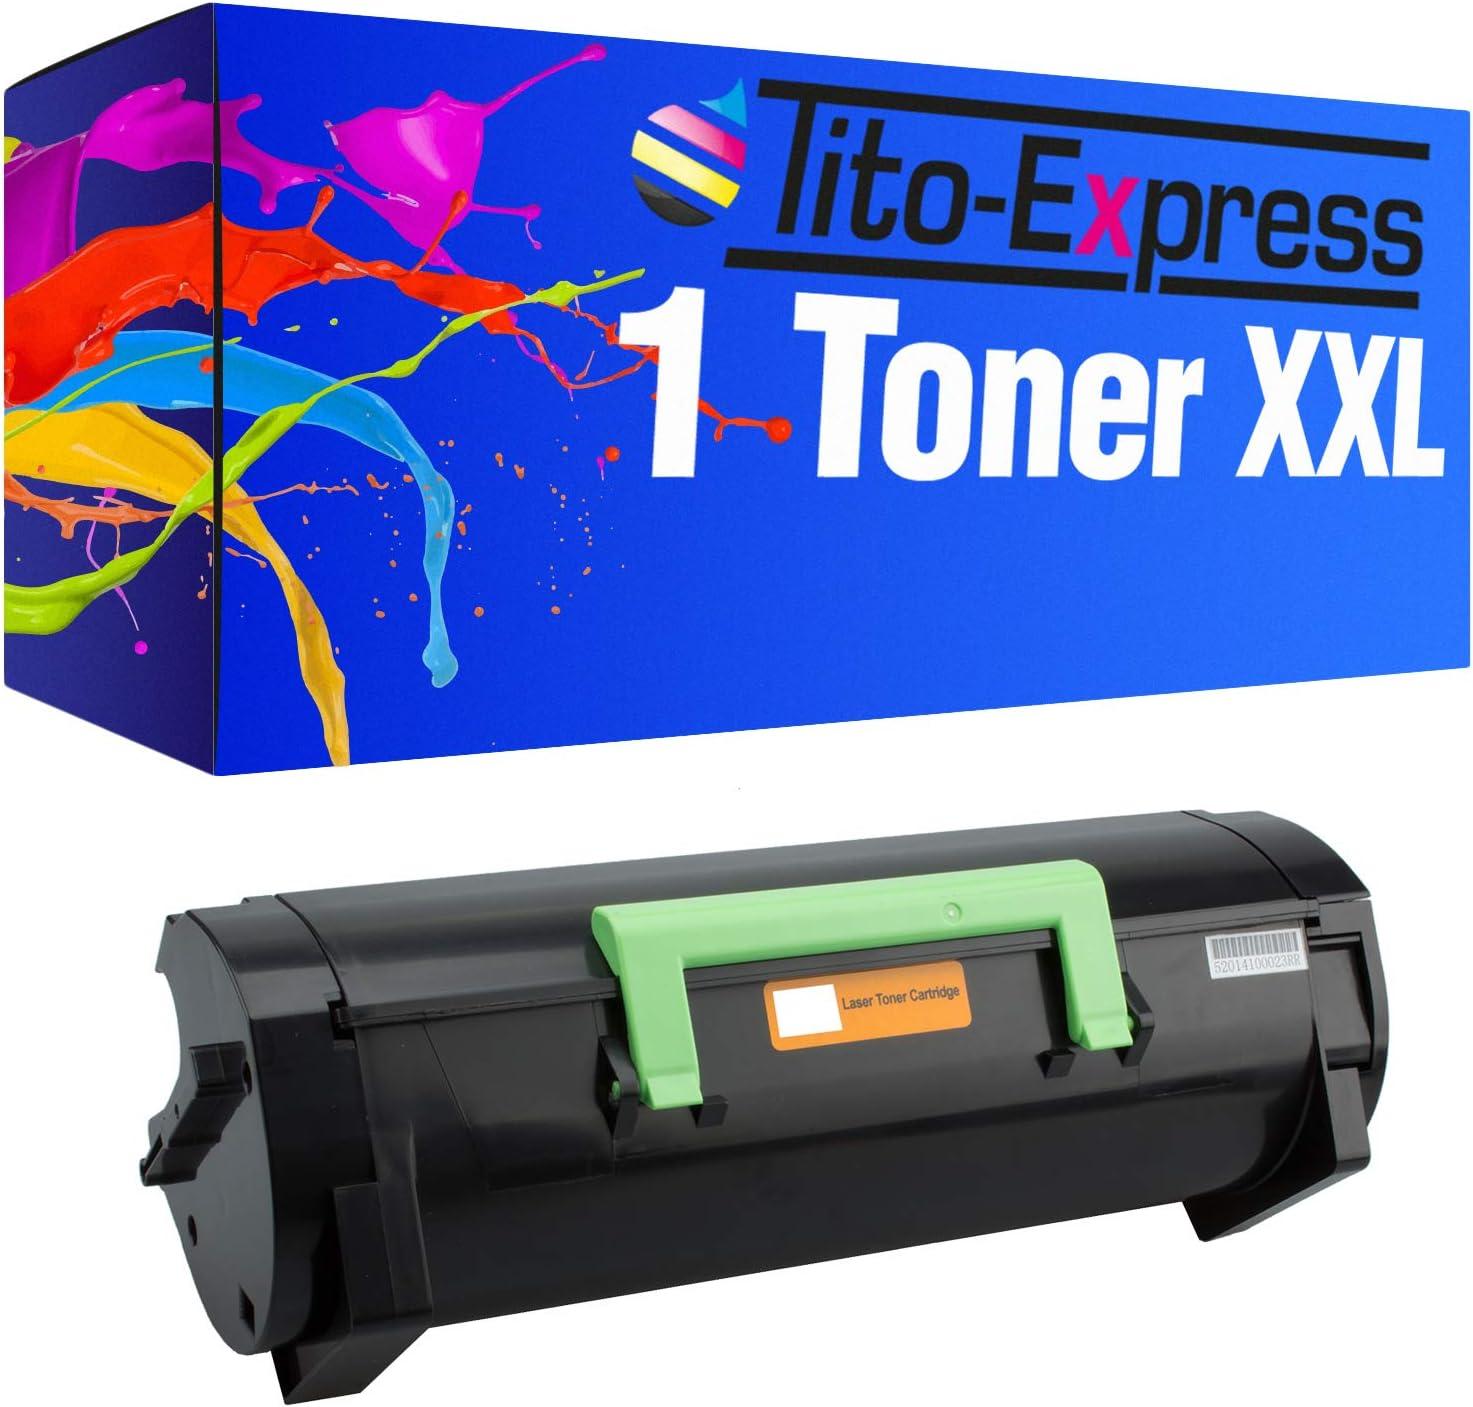 Tito Express Platinumserie 1 Toner Xxl Kompatibel Mit Lexmark Ms 310 Ms310d Ms310dn Ms312dn Ms315dn Ms410d Ms410dn Ms510dn Ms610de Ms610dn Ms610dte Ms610dtn 50f2h00 Black 5 000 Seiten Bürobedarf Schreibwaren